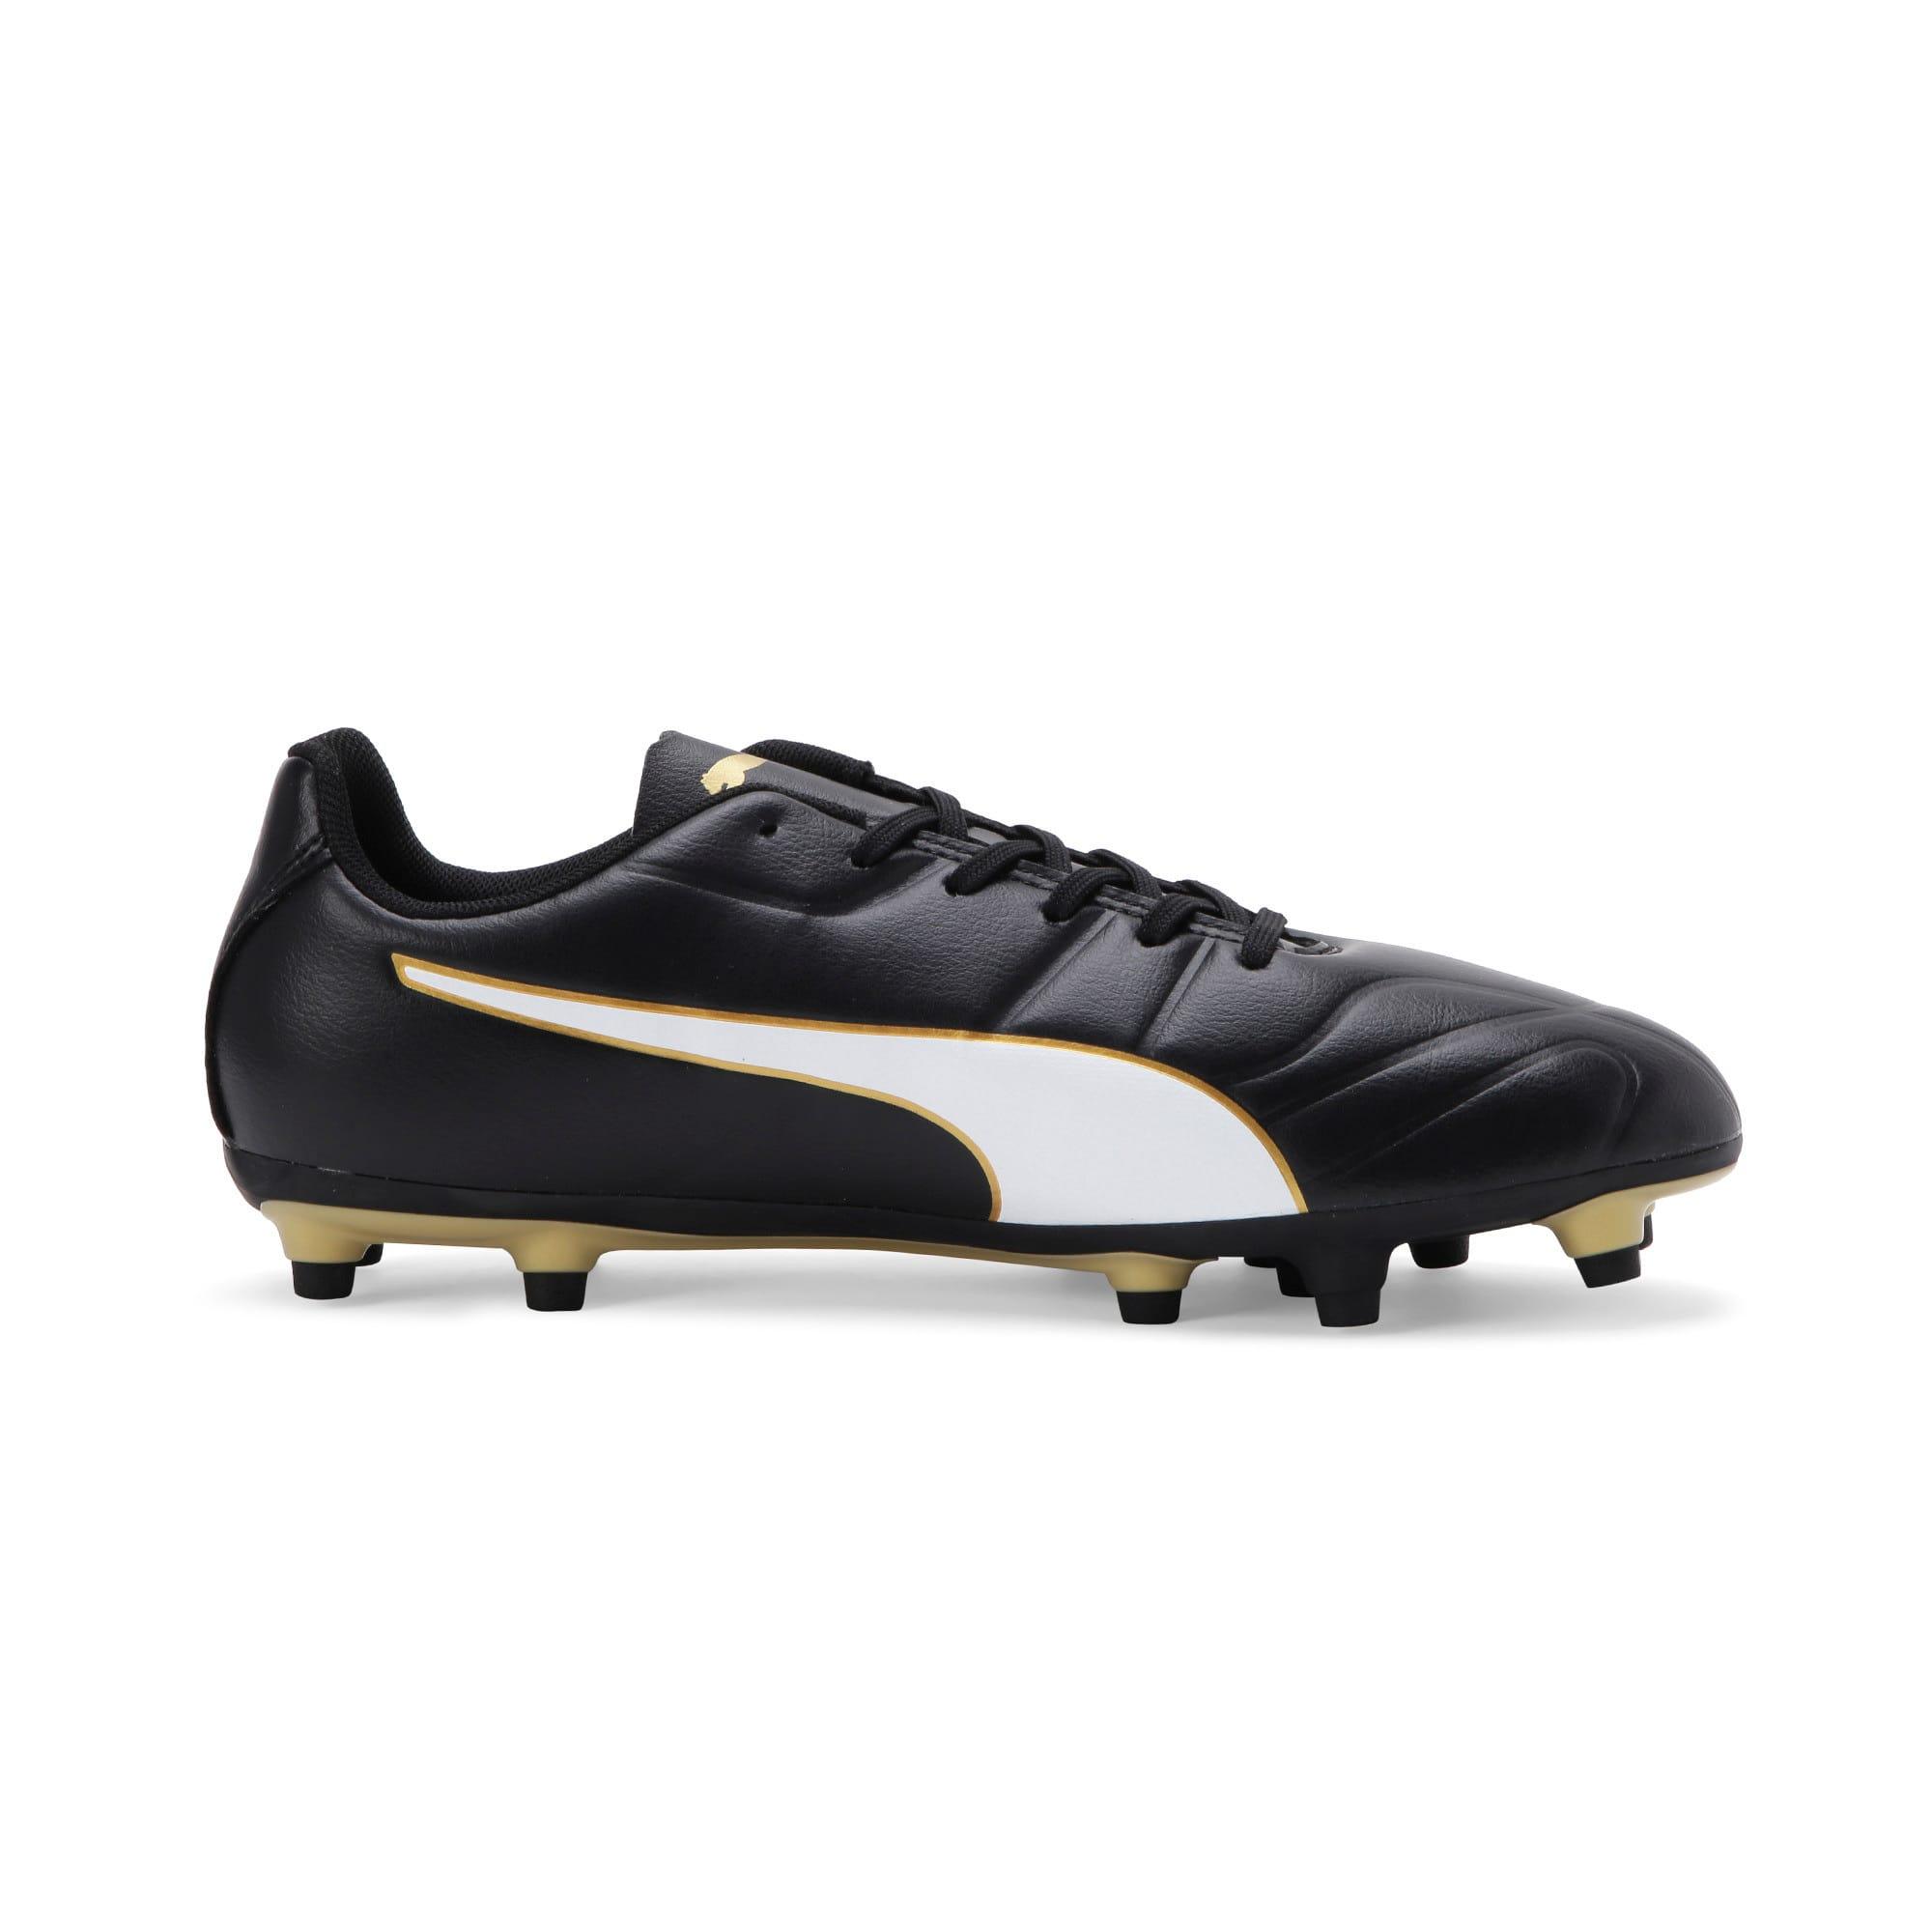 Thumbnail 5 of Classico C II FG Men's Football Boots, Black-White-Gold, medium-IND